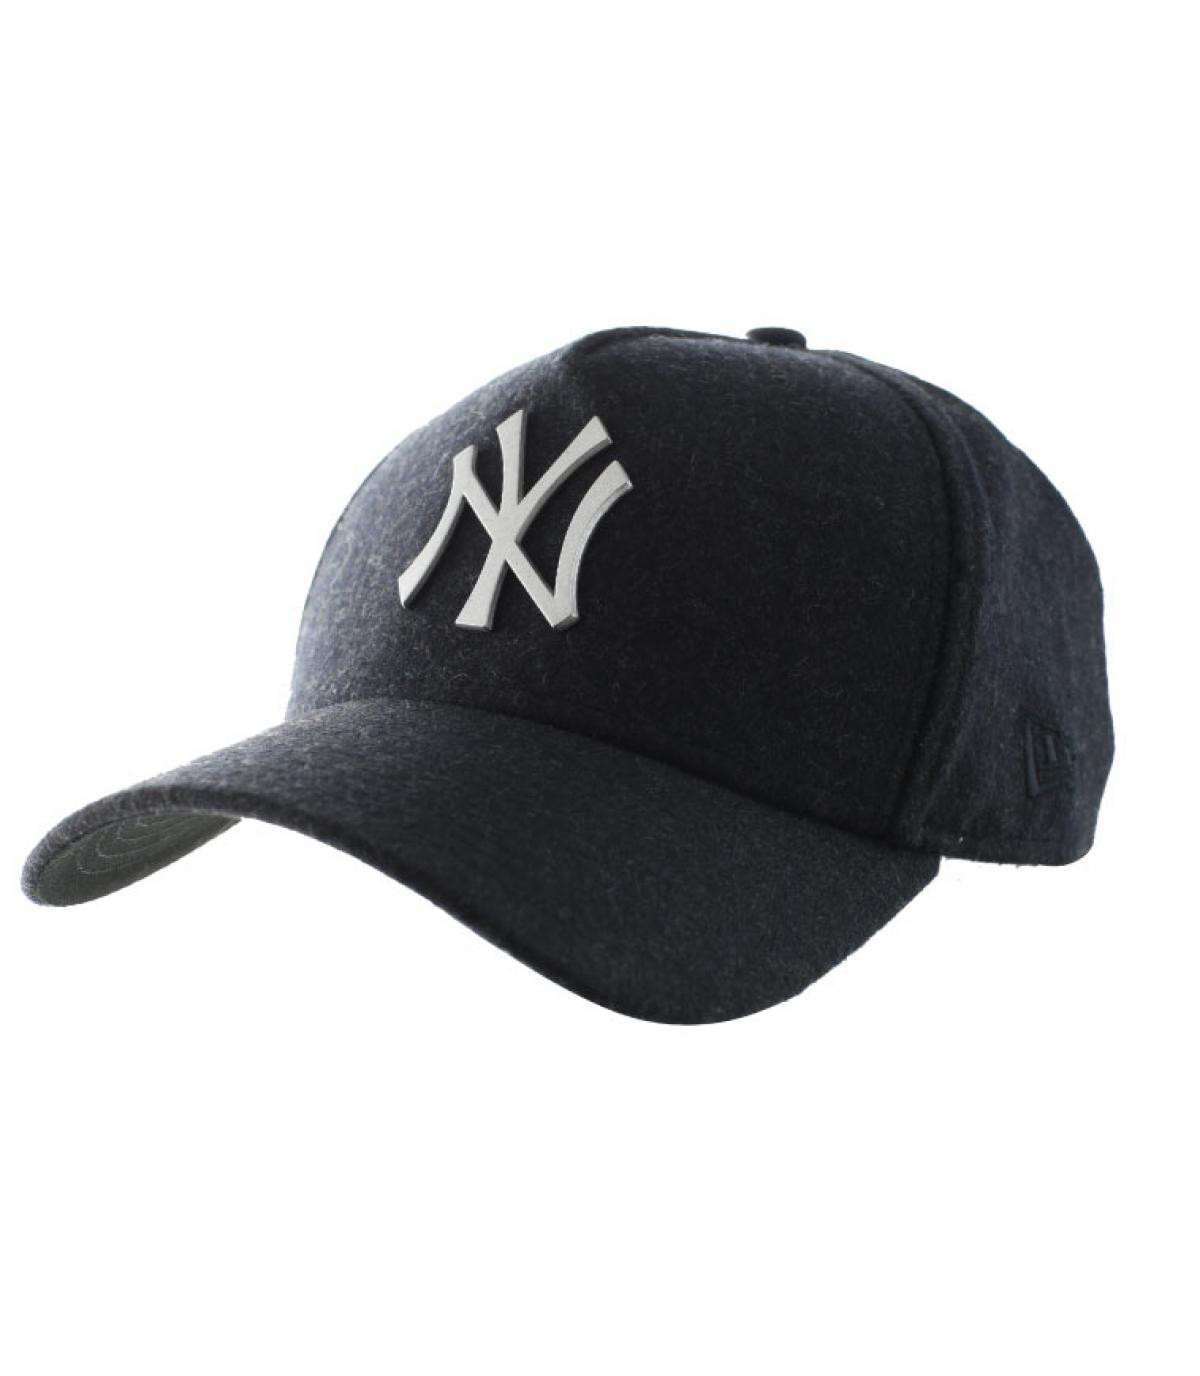 Nero logo in metallo cappello NY - Trucker NY Melton Metal black da ... 5db2edd09890